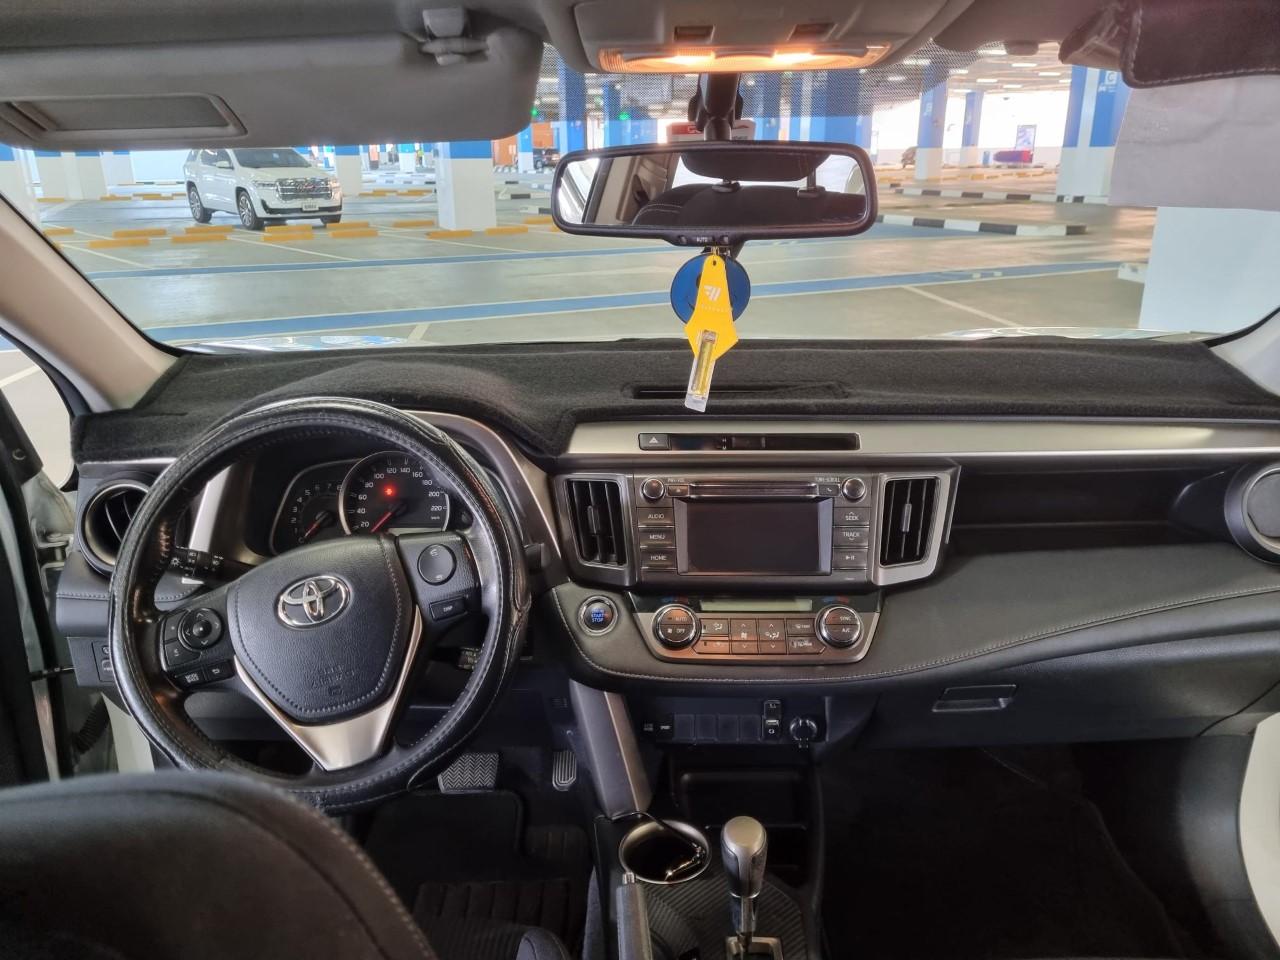 Toyota RAV4 GXR 4WD 2015 GCC - Image 4